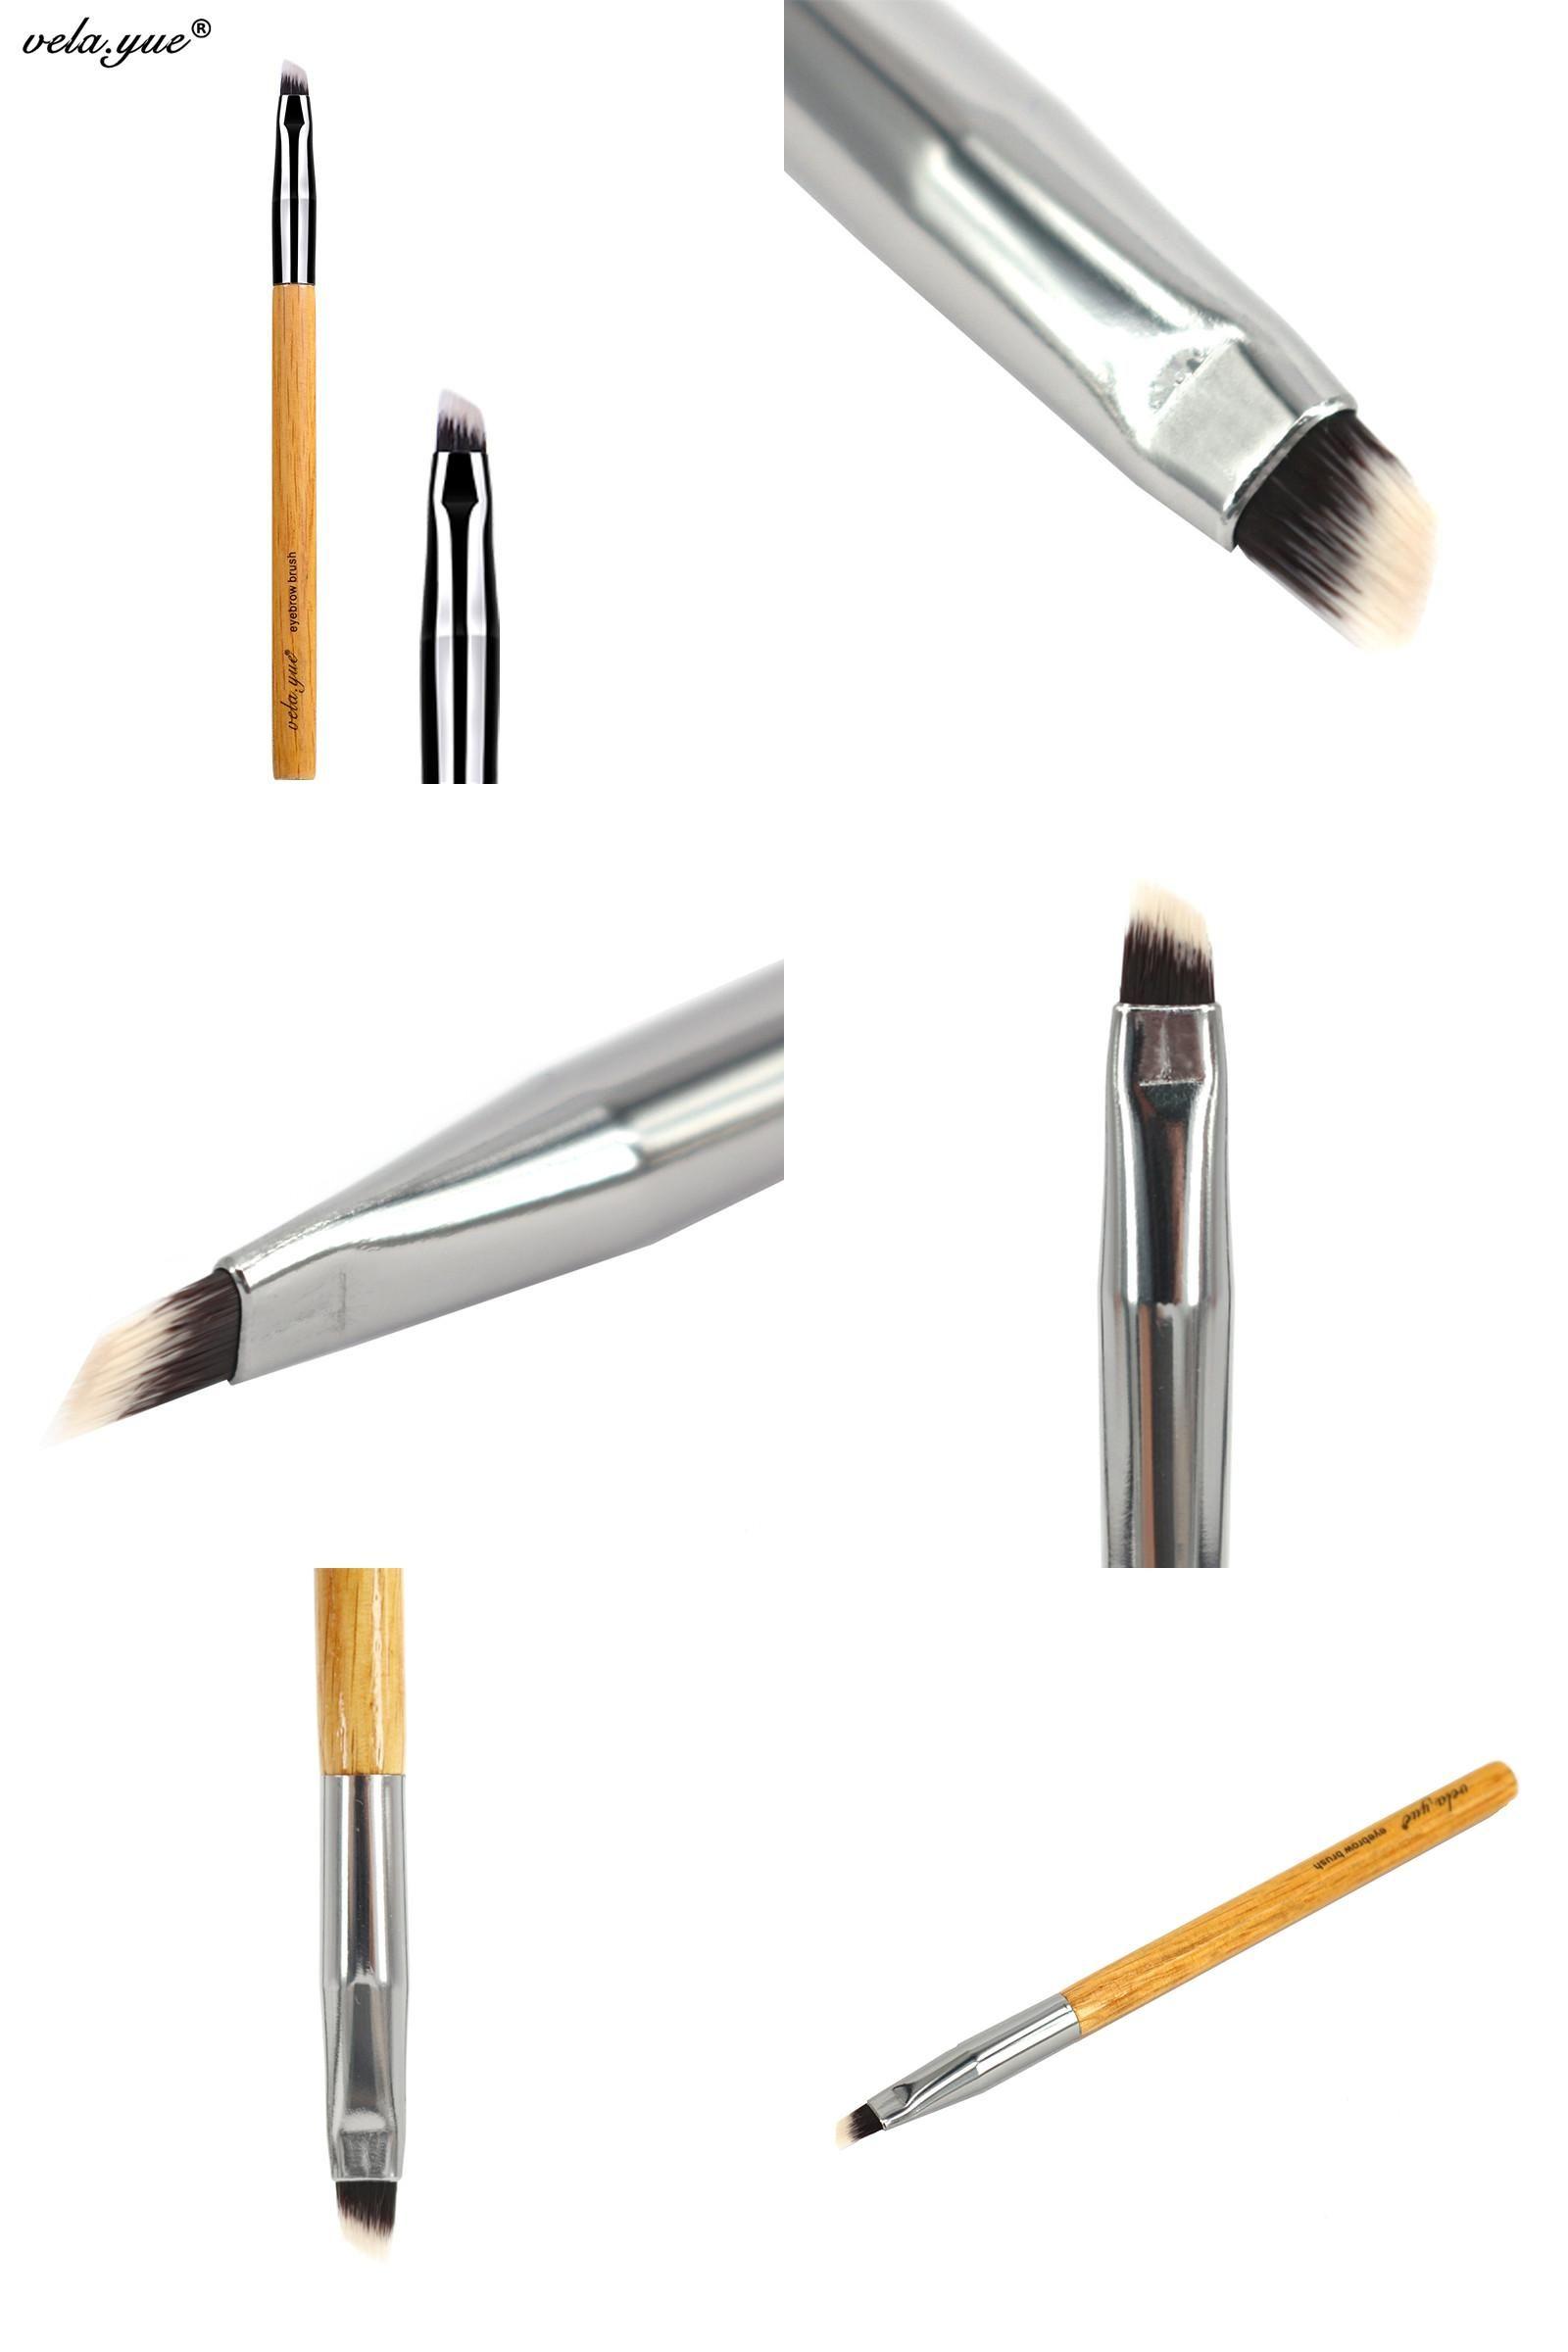 [Visit to Buy] vela.yue Angled Eyebrow Eyeliner Brush